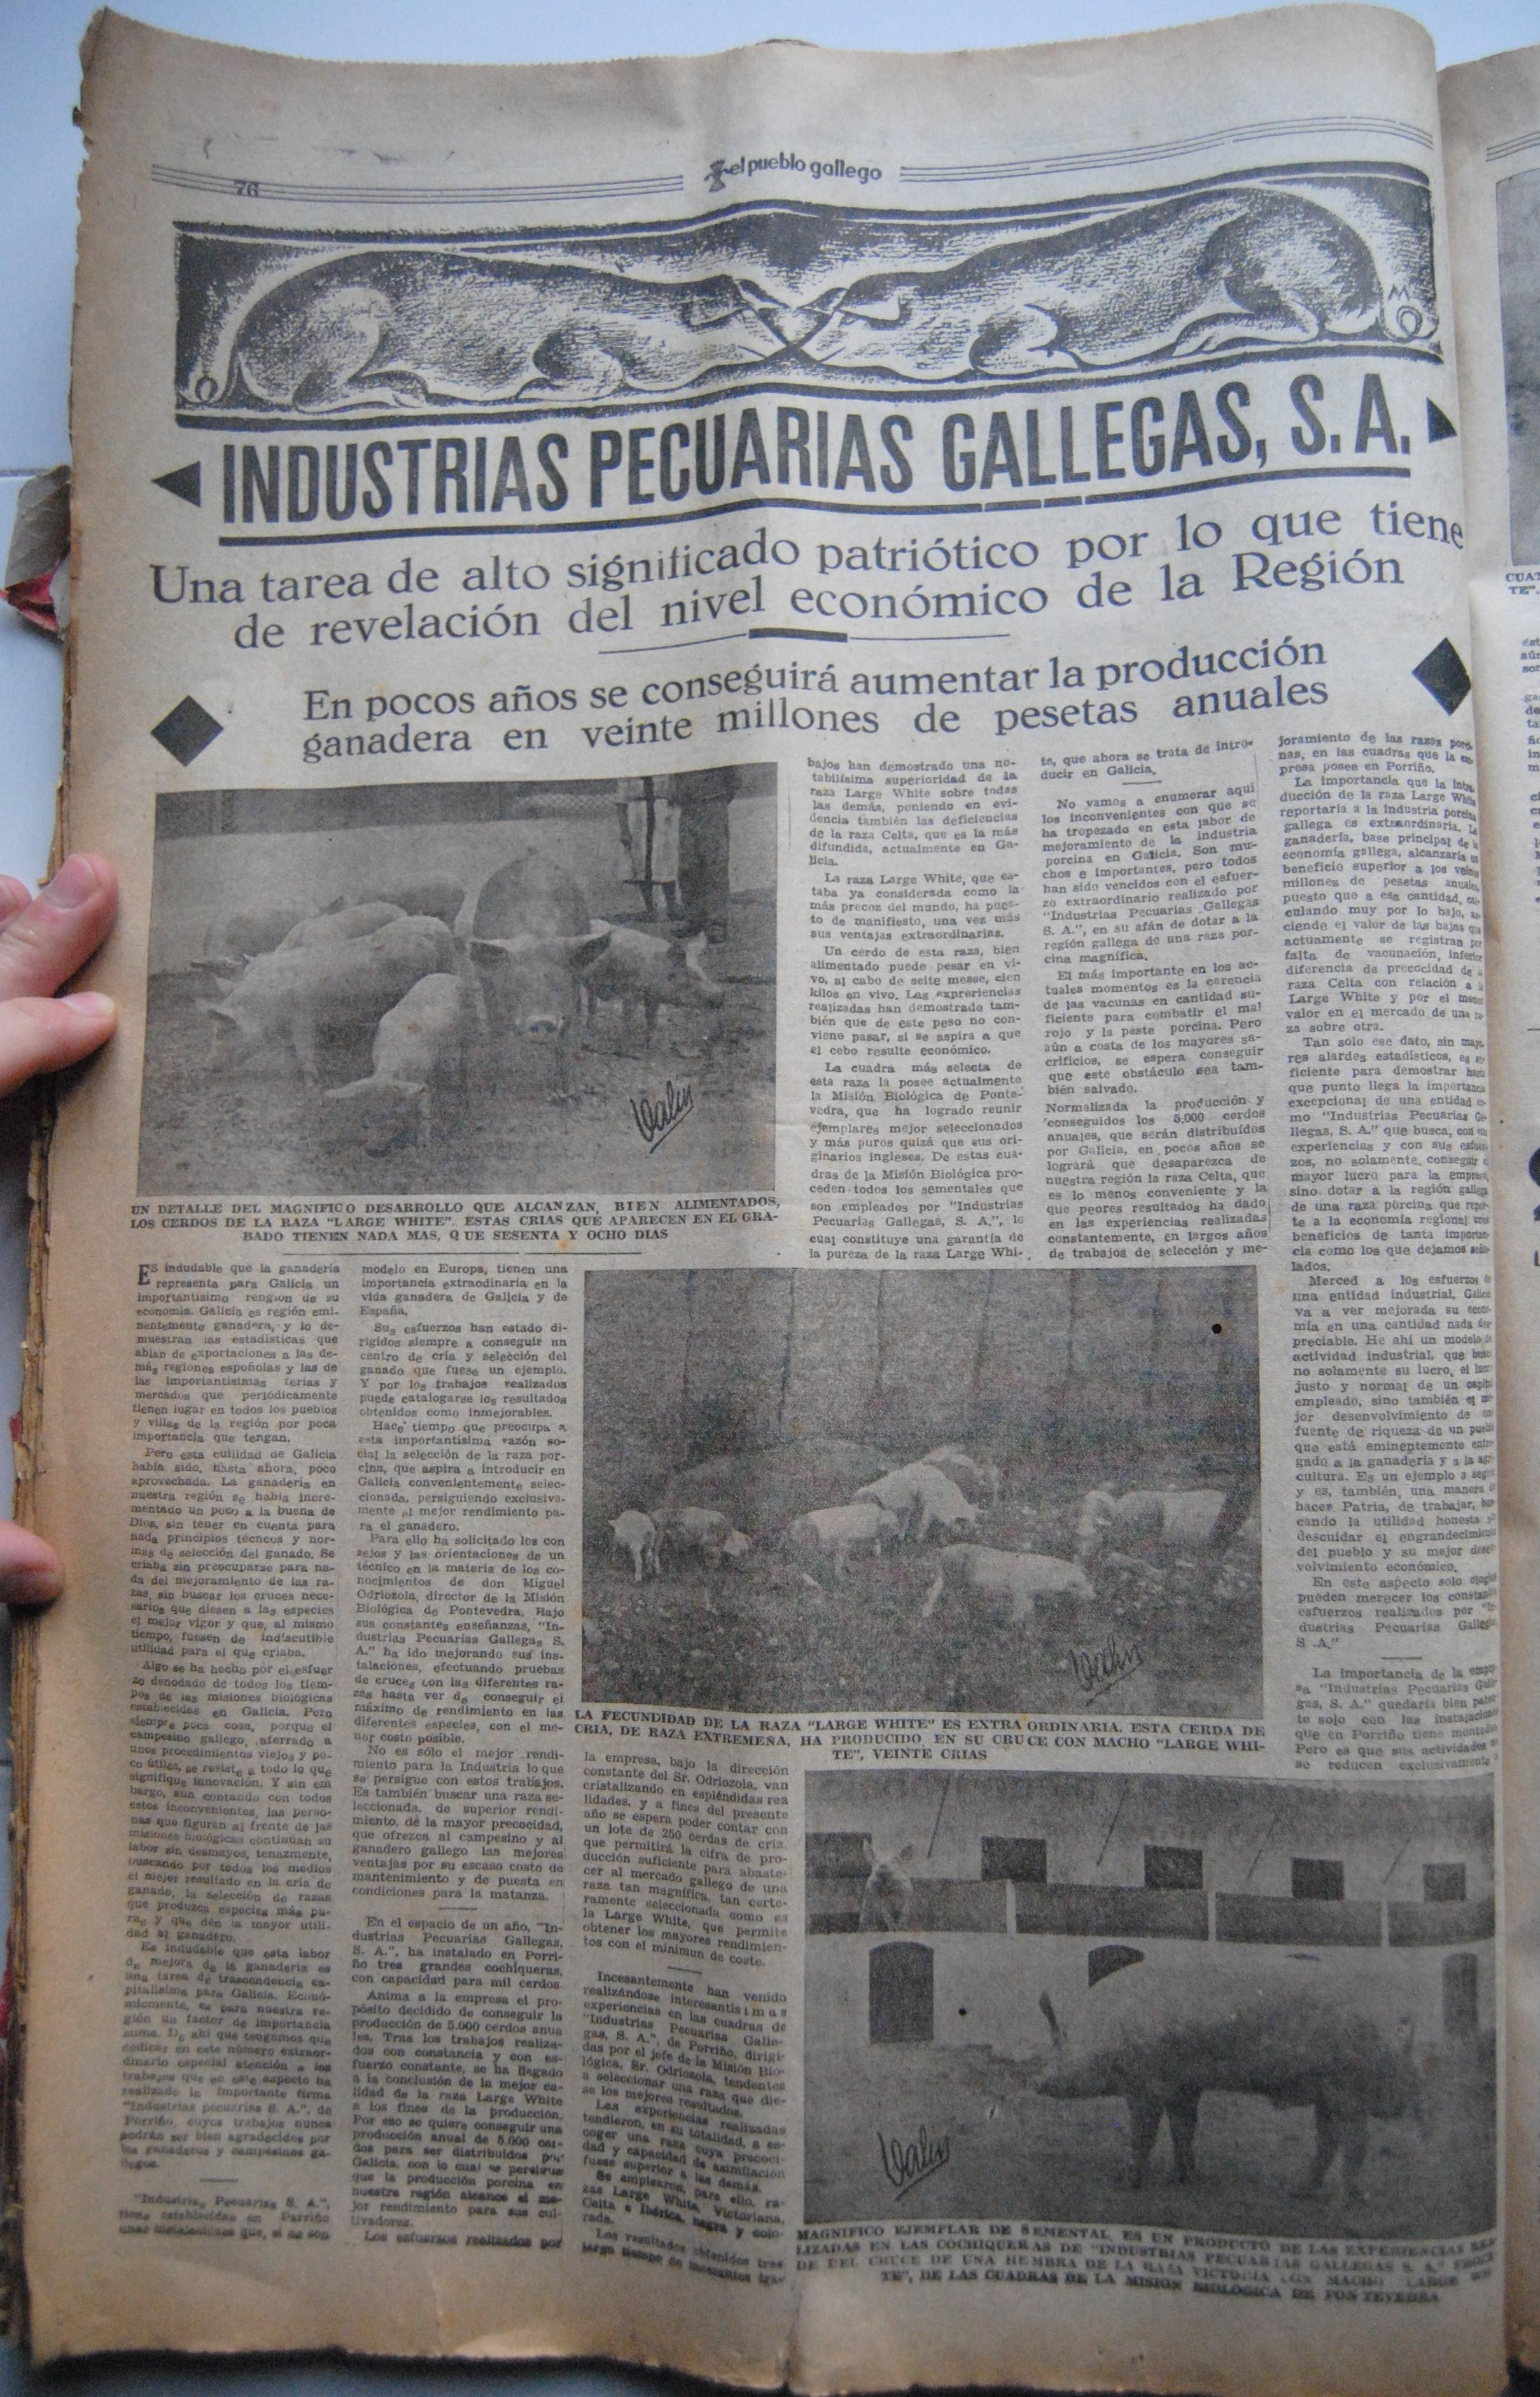 Industrias Pecuarias